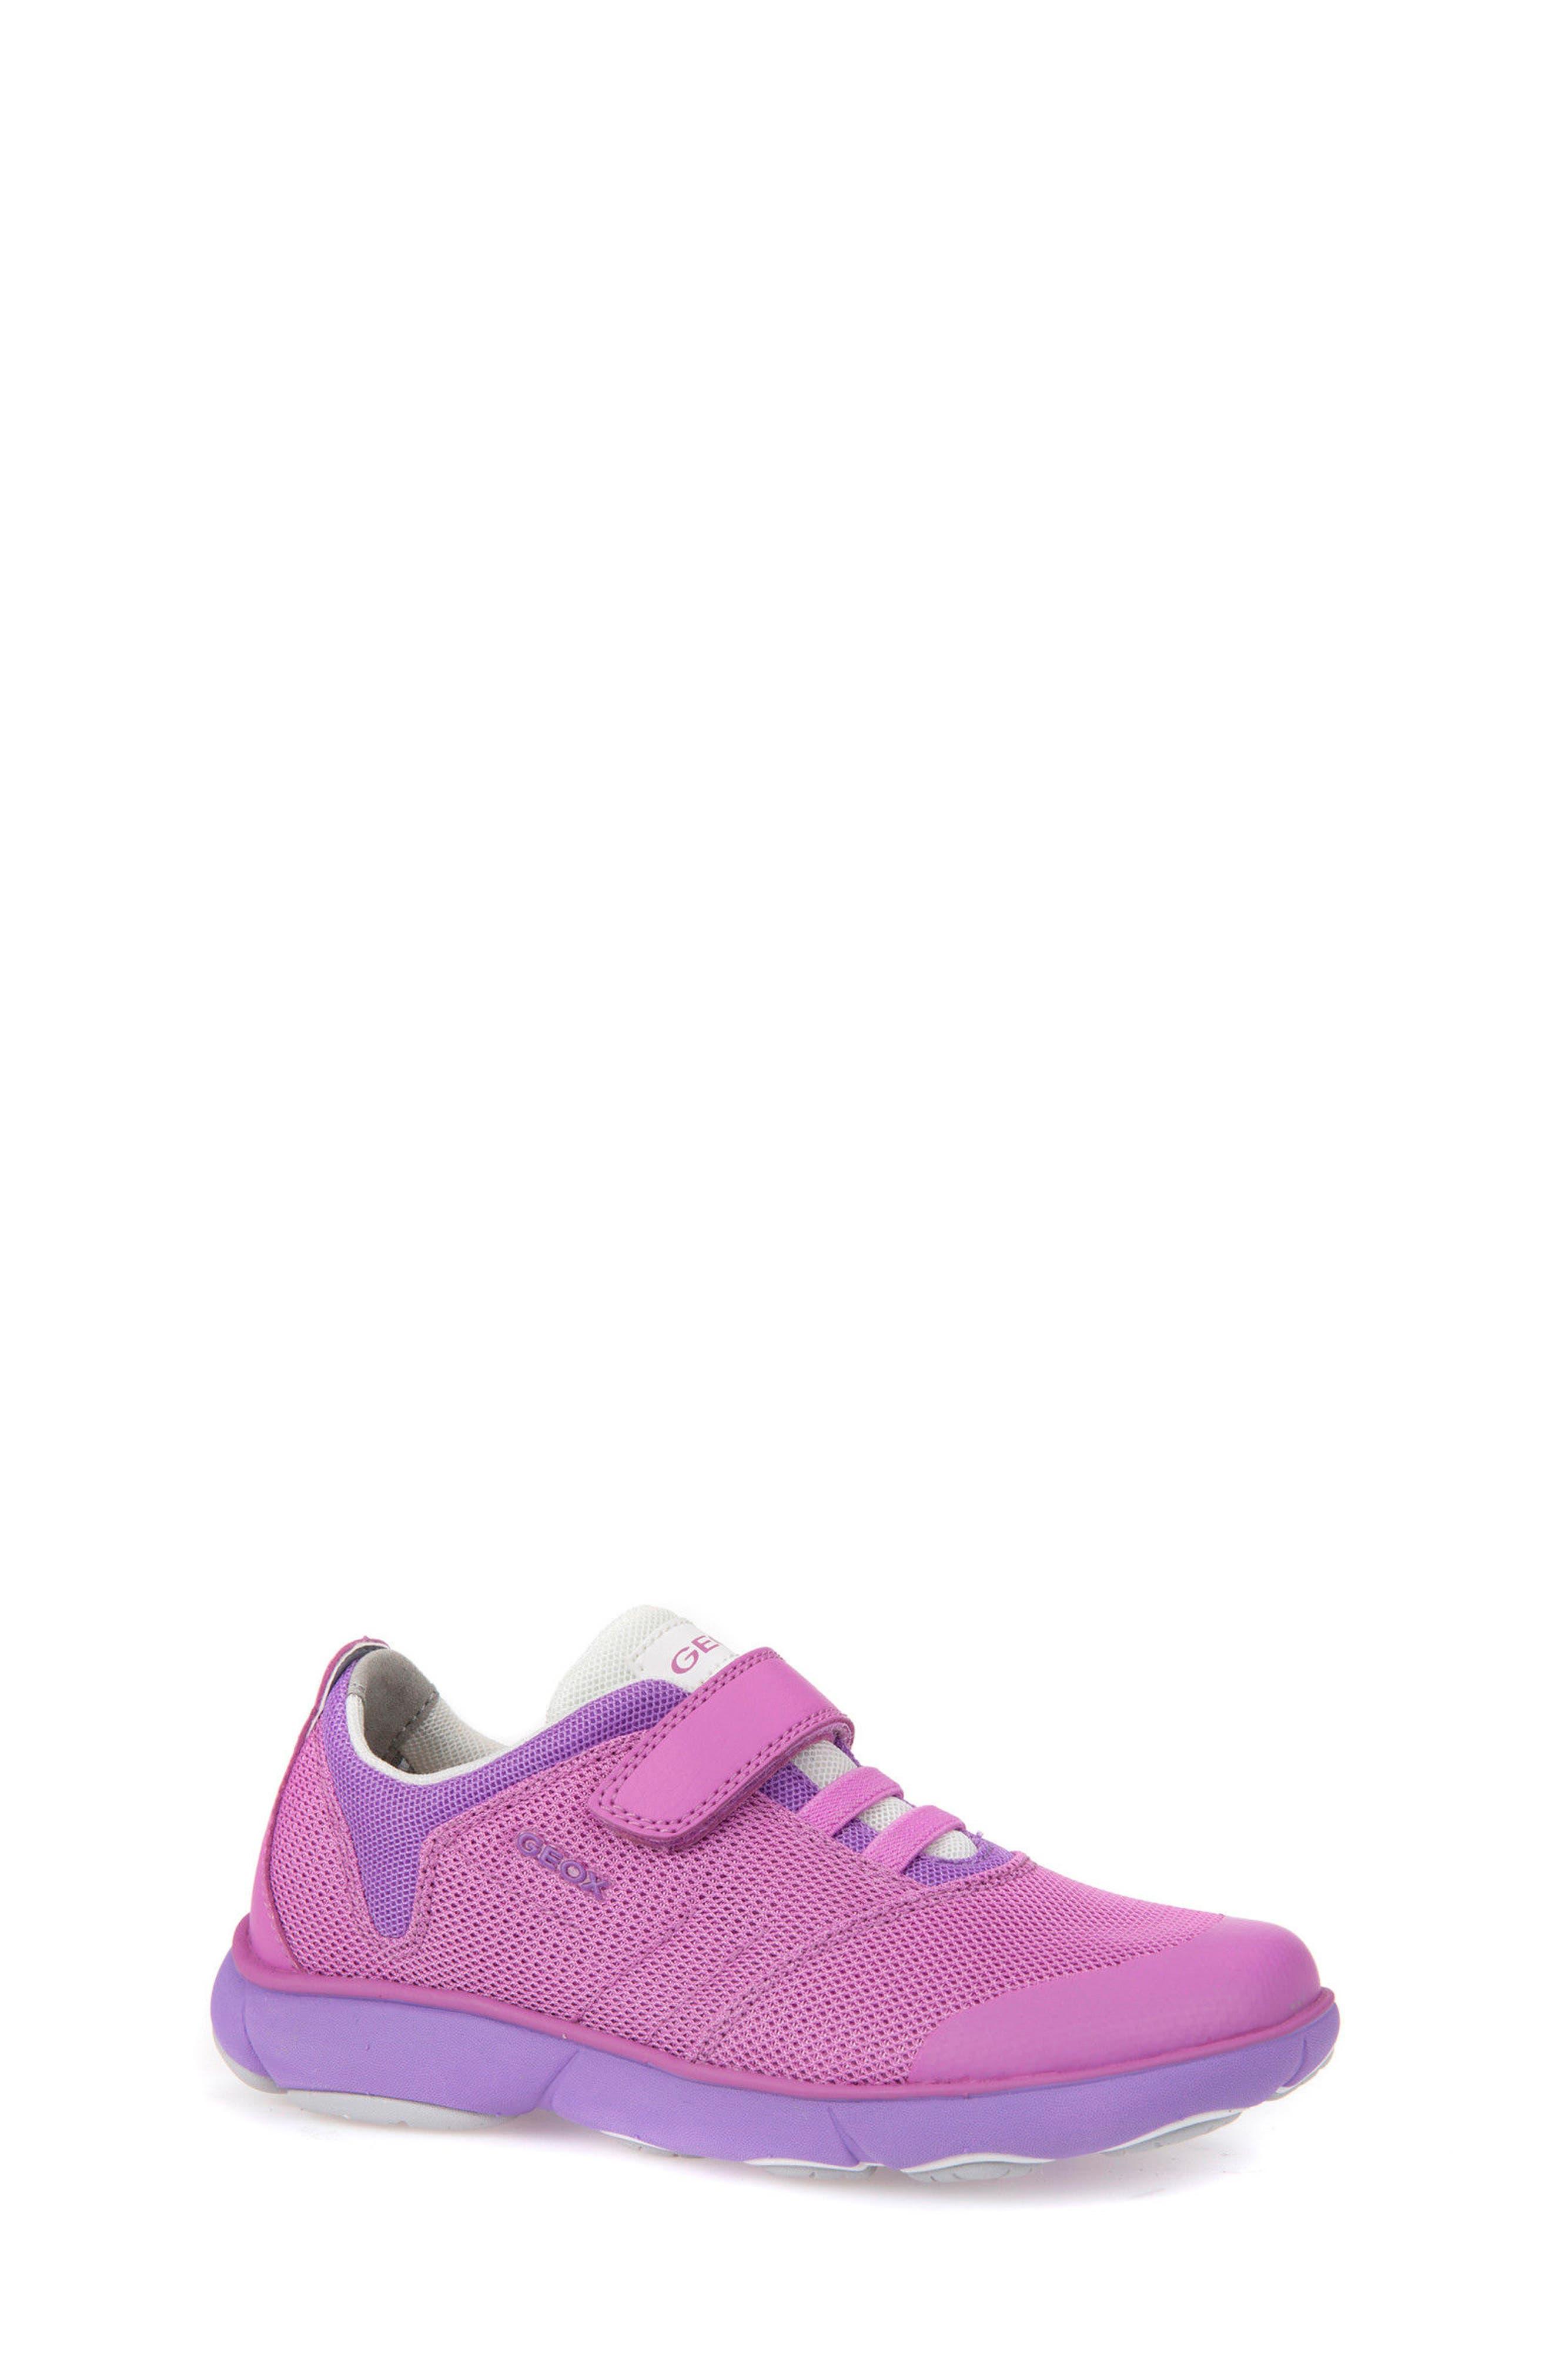 Jr Nebula Waterproof Sneaker,                         Main,                         color, FUCHSIA